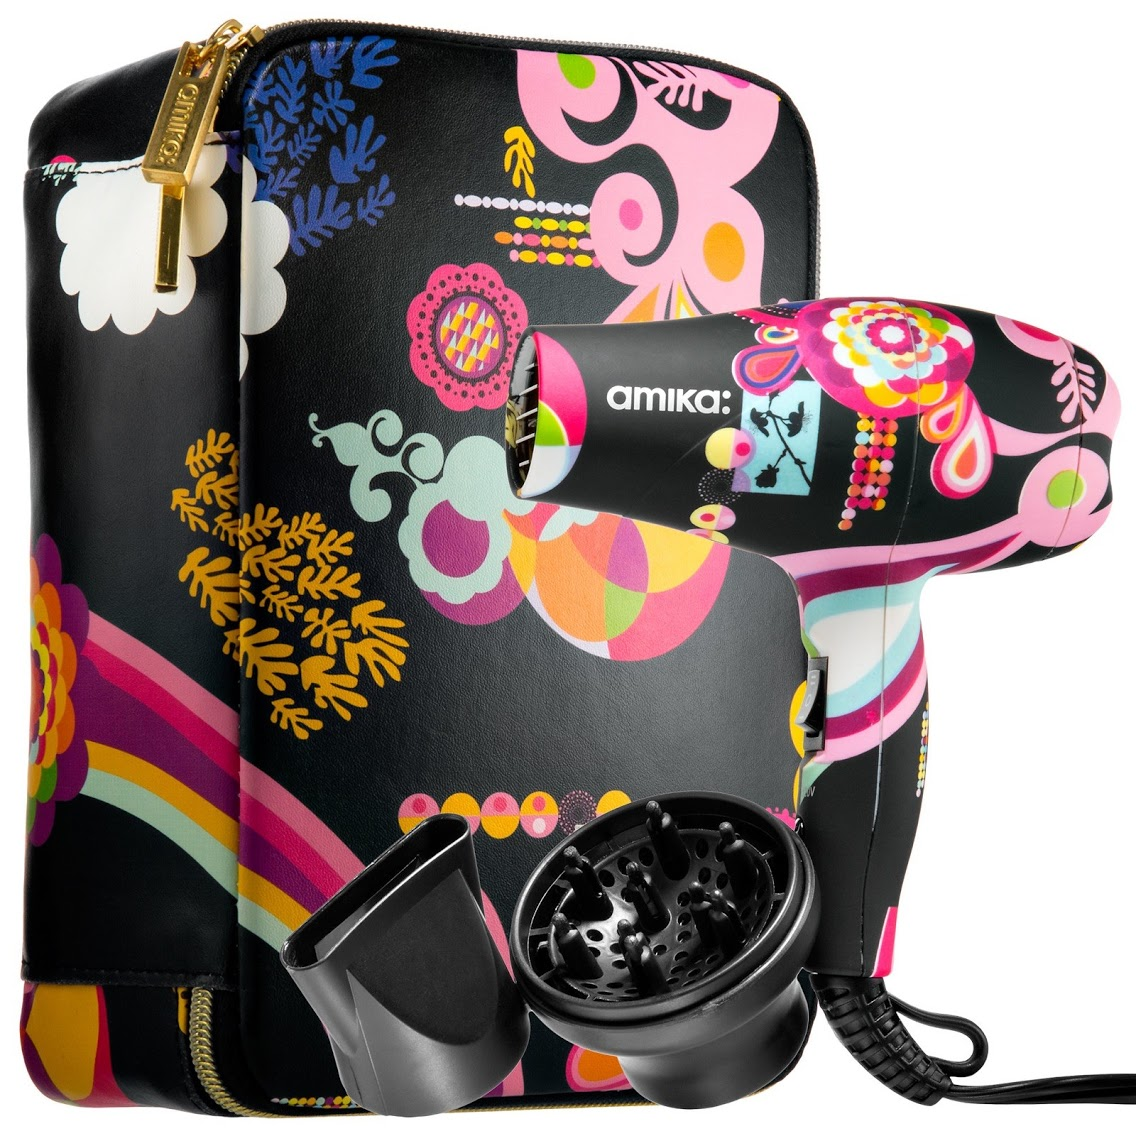 http://www.loveamika.com/shop/tools/mini-ionic-dryer